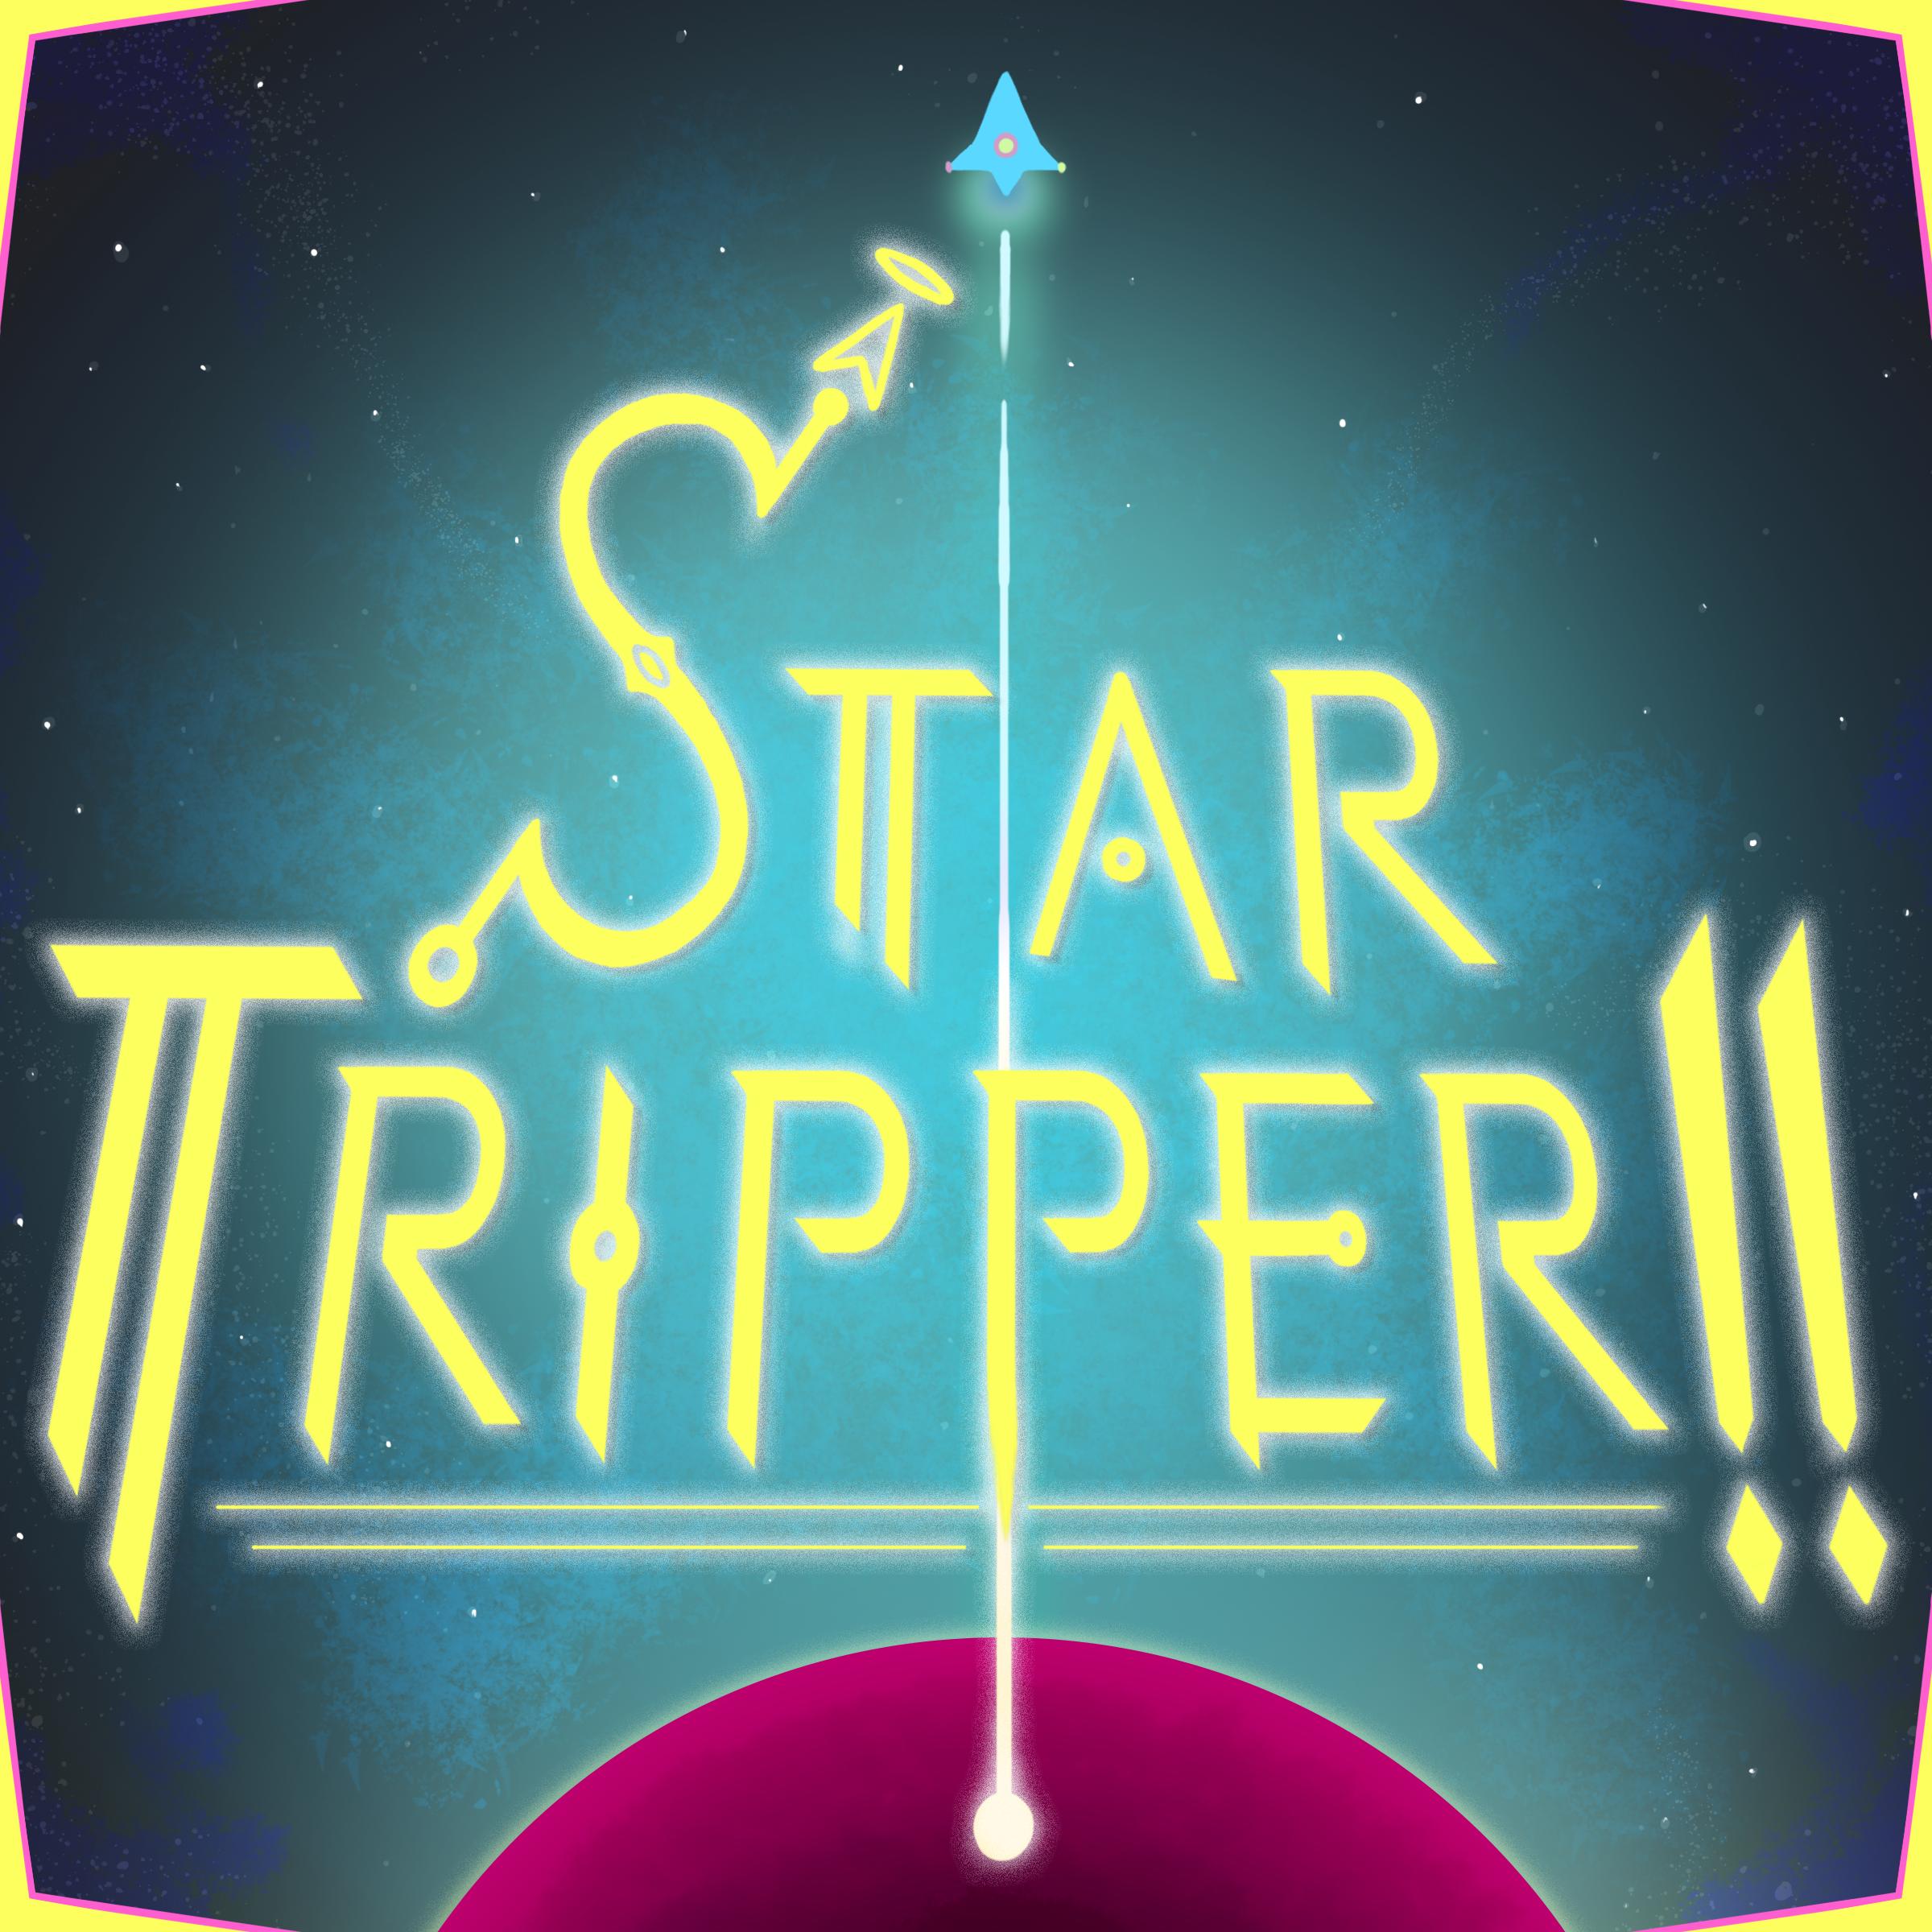 """StarTripper!!"" Podcast"